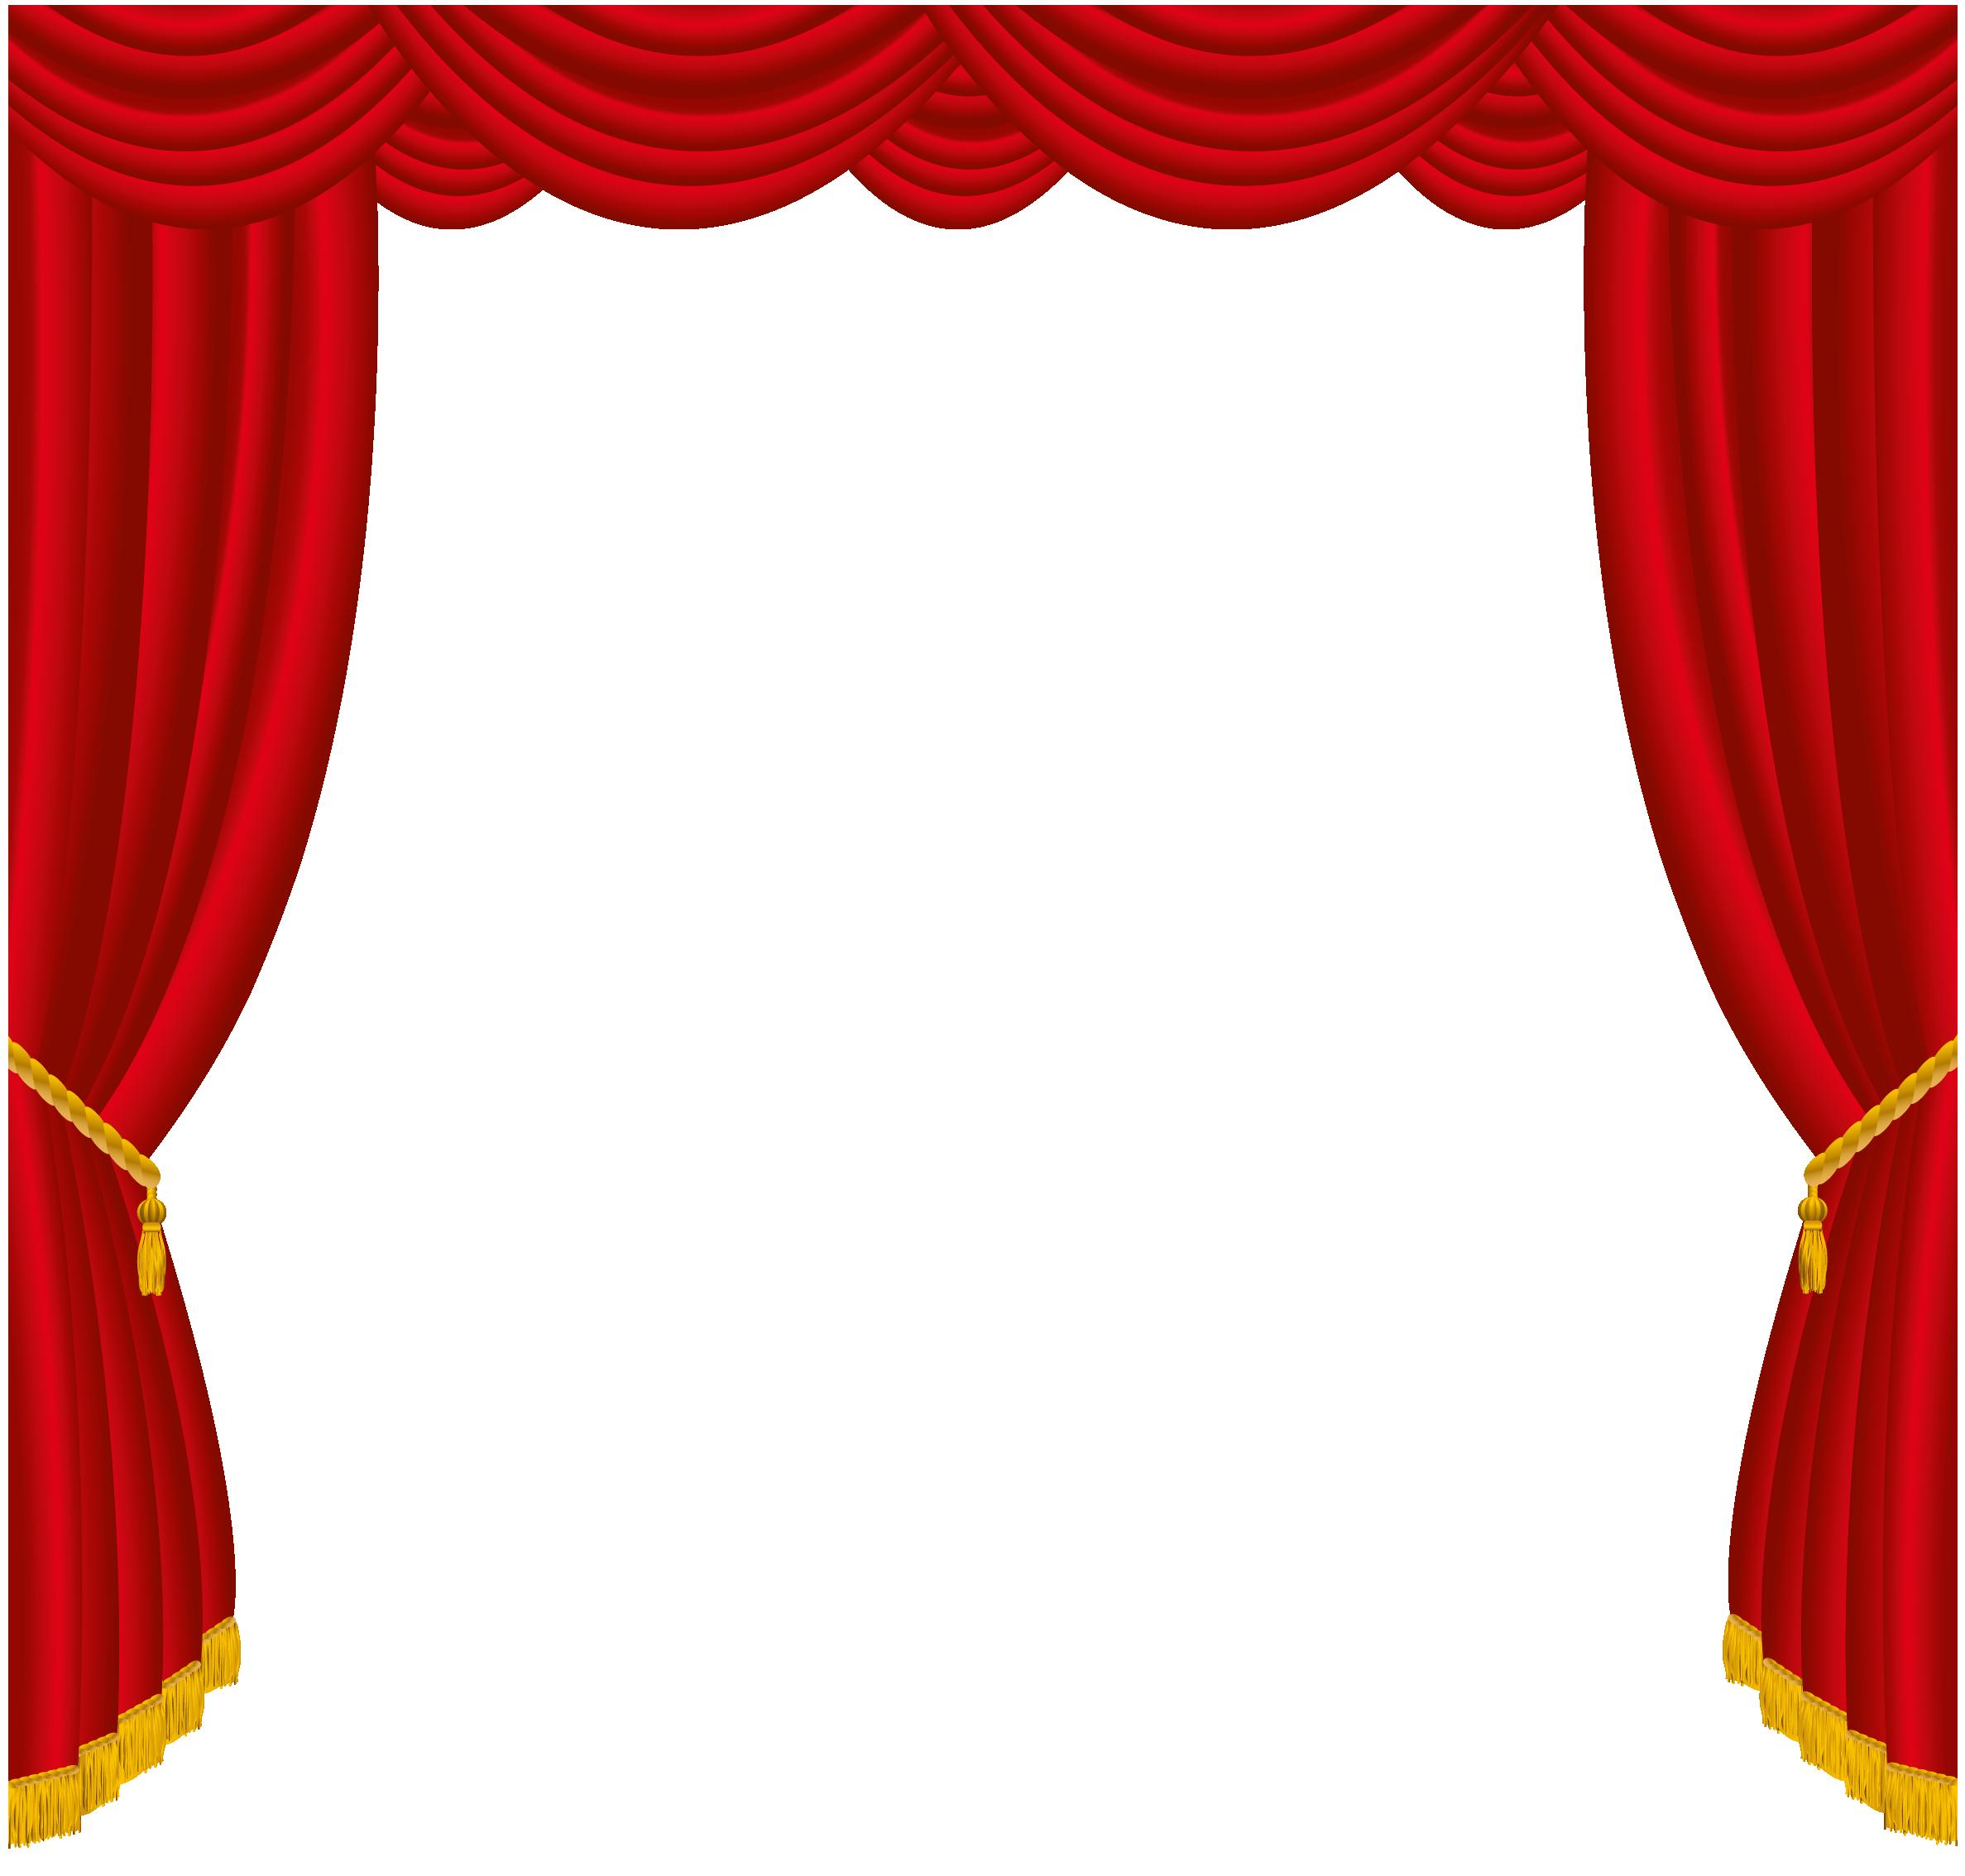 Curtain Clip Art Cliparts Co-Curtain Clip Art Cliparts Co-0